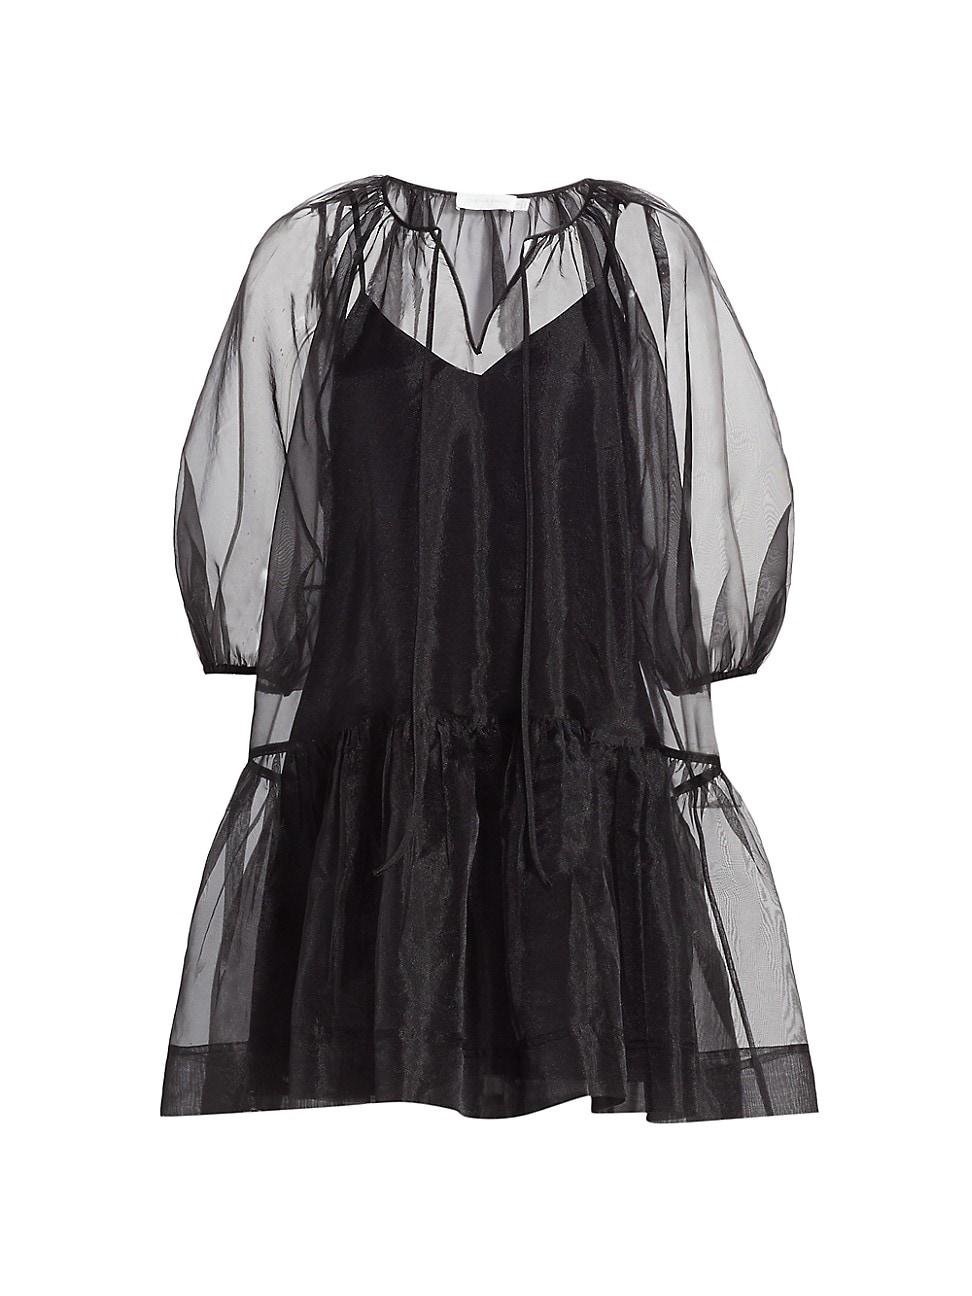 Jonathan Simkhai WOMEN'S EVERLEE ORGANZA PUFF-SLEEVE MINI DRESS